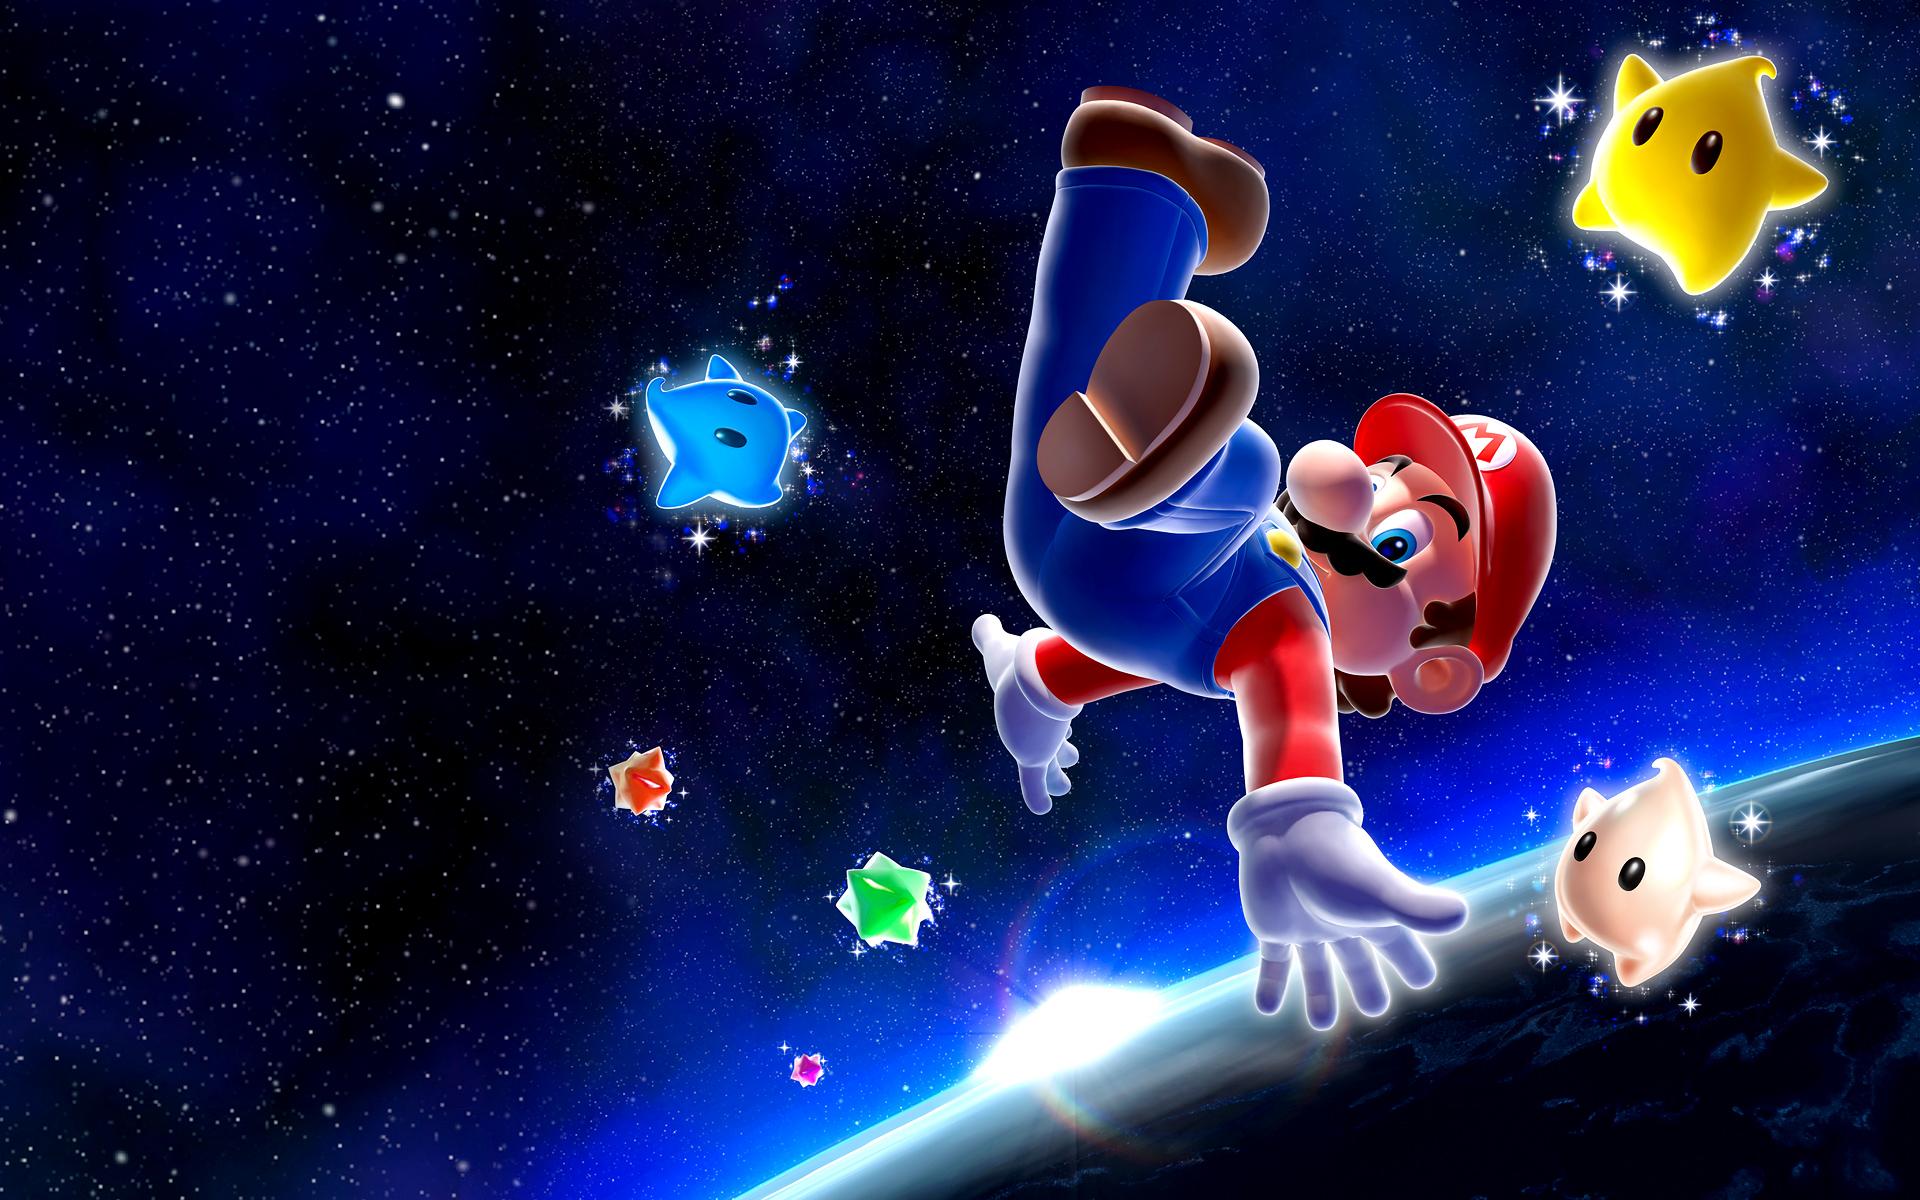 Mario Character Super Mario Bros Wallpaper 851866